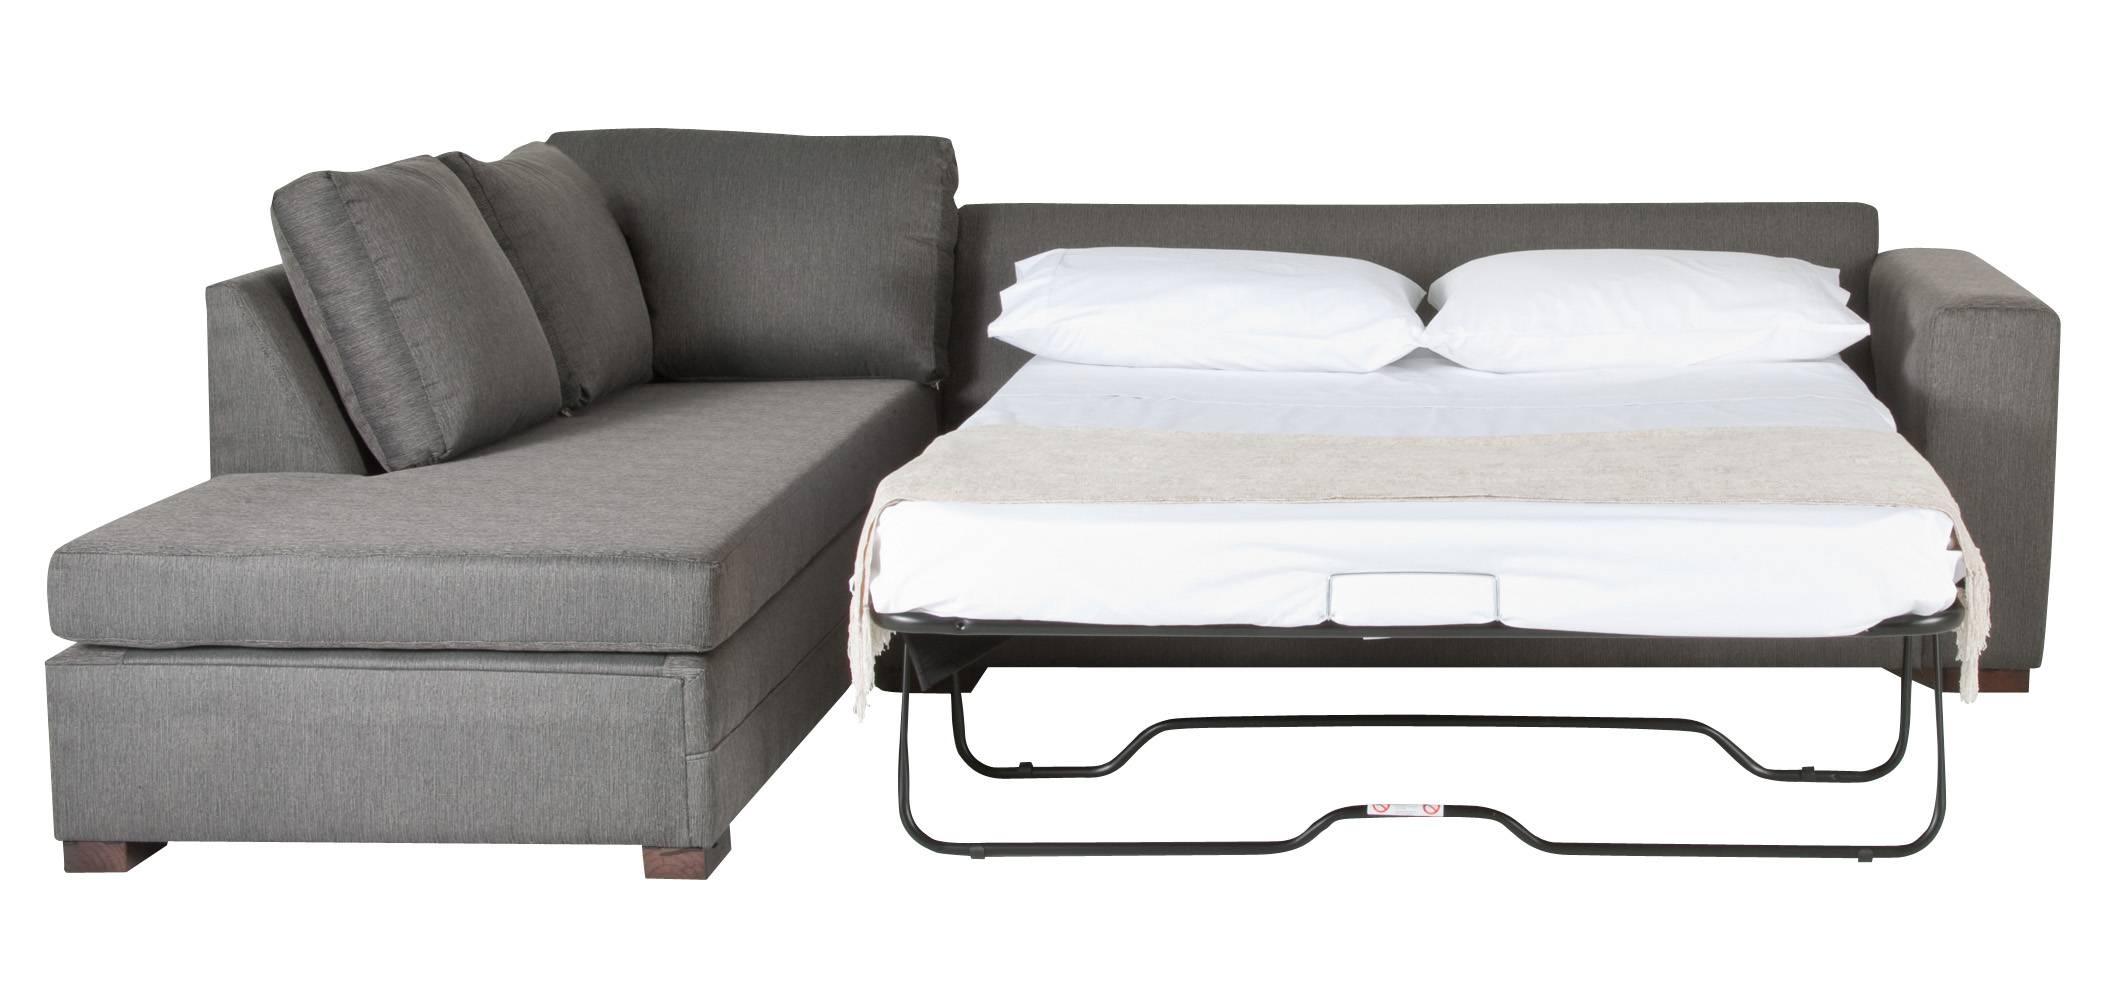 Ikea Sleeper Sofa Loveseat | Sofas Decoration for Ikea Loveseat Sleeper Sofas (Image 13 of 30)